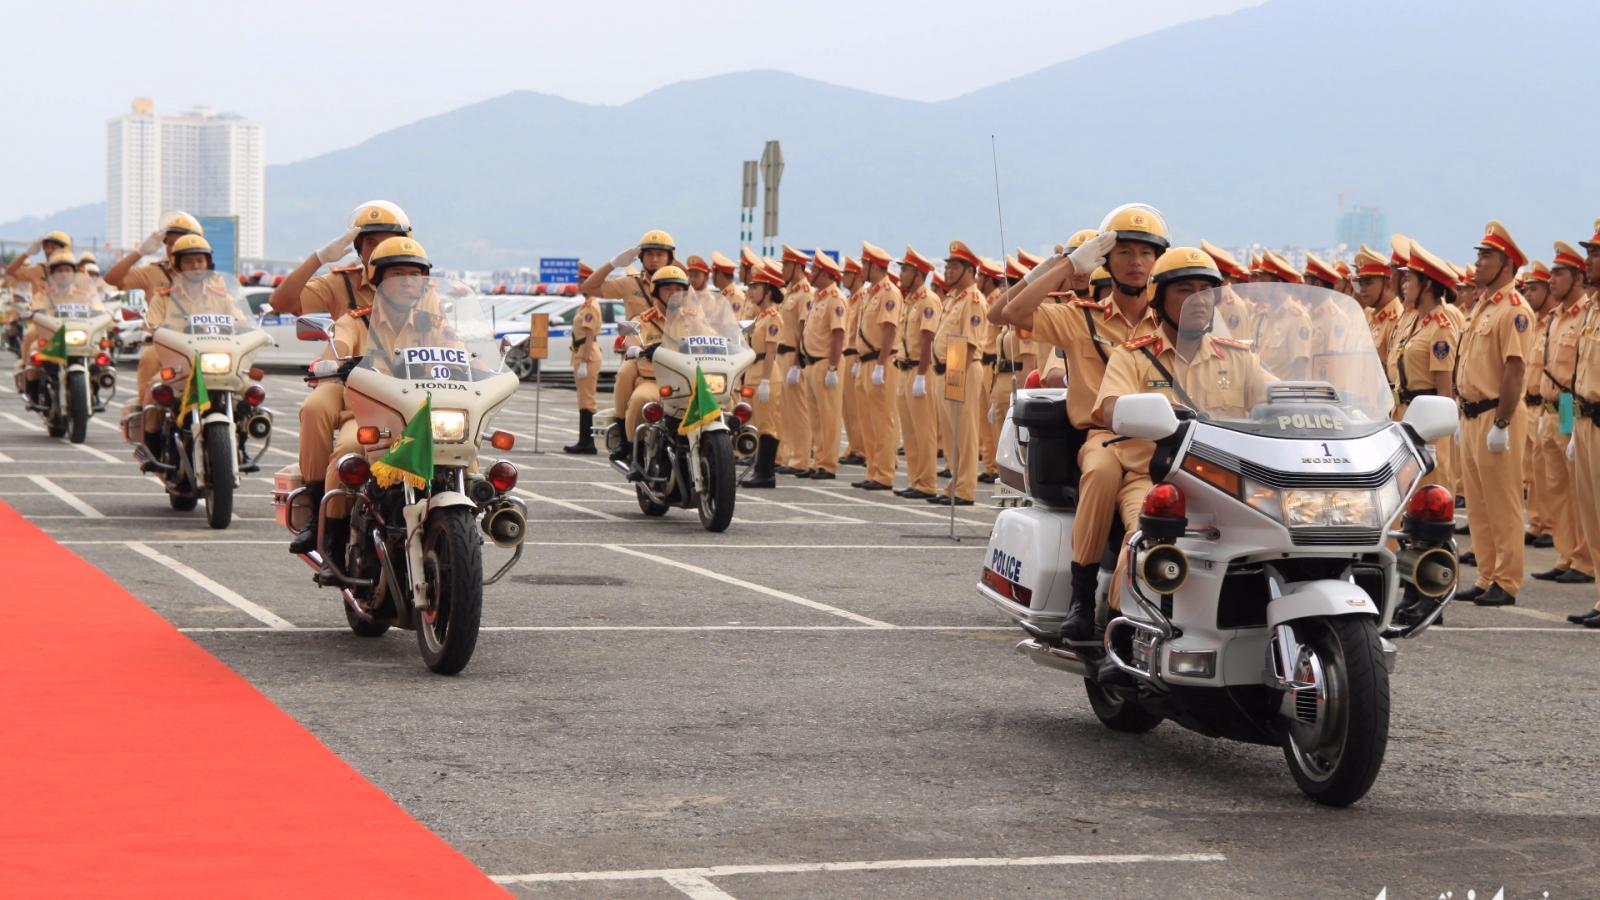 Nearly 800 traffic cops ready for APEC week in Da Nang